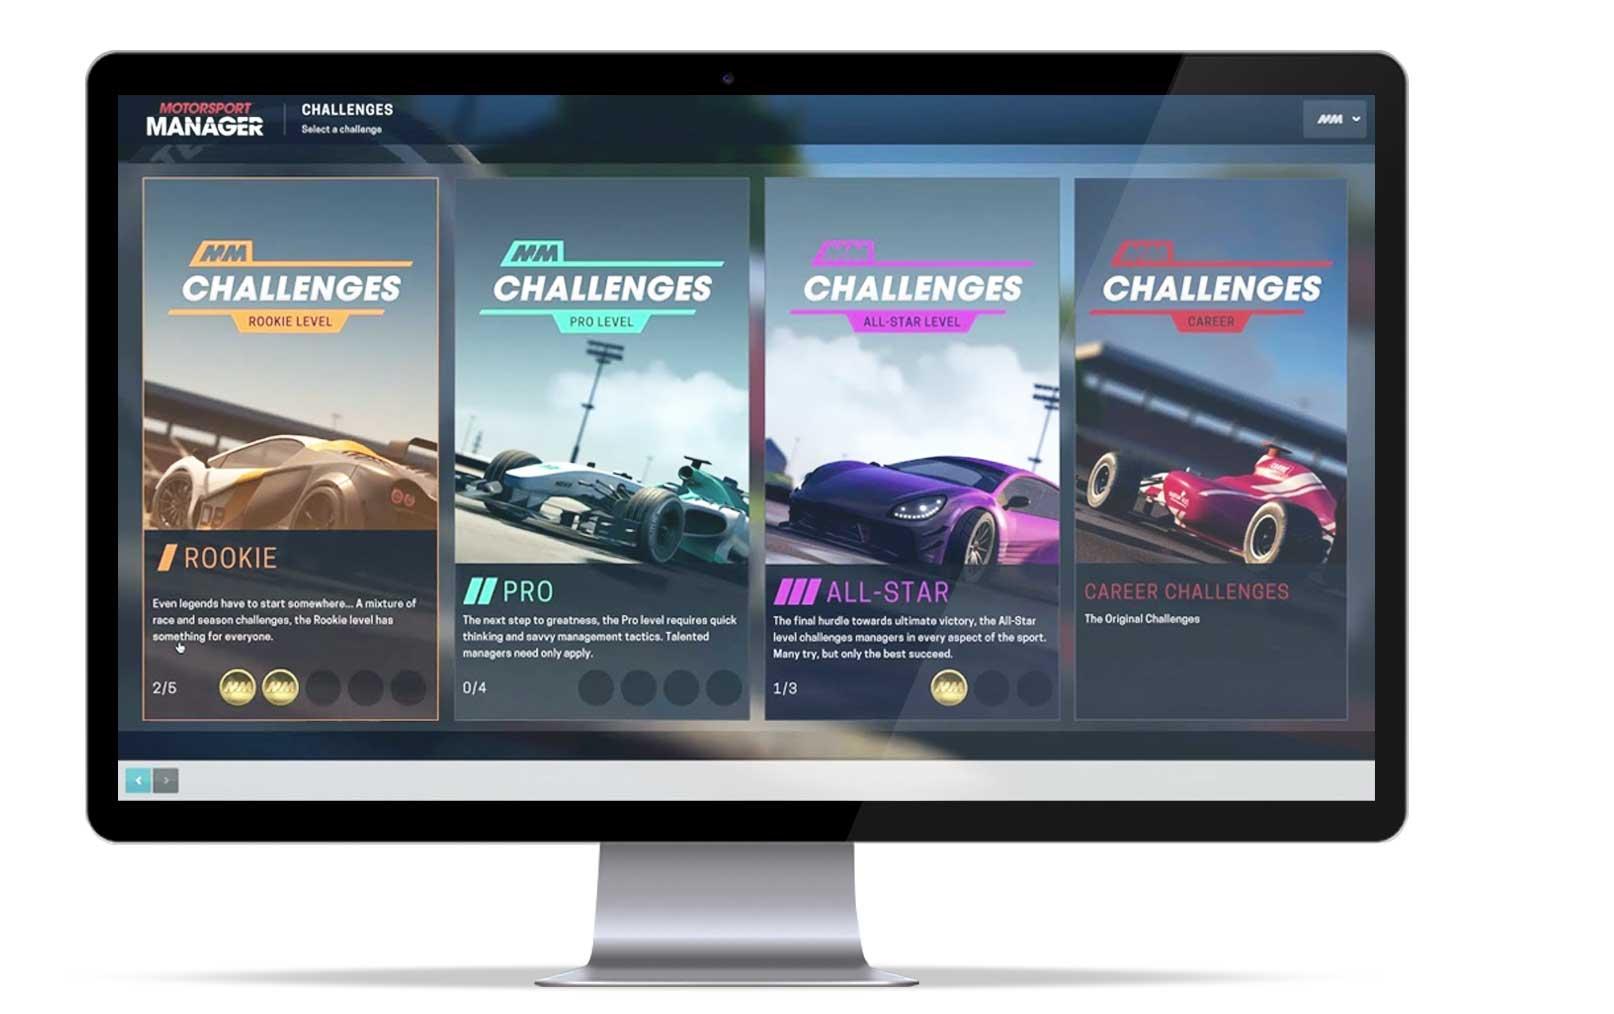 game_pc_dlc_challenge_screen